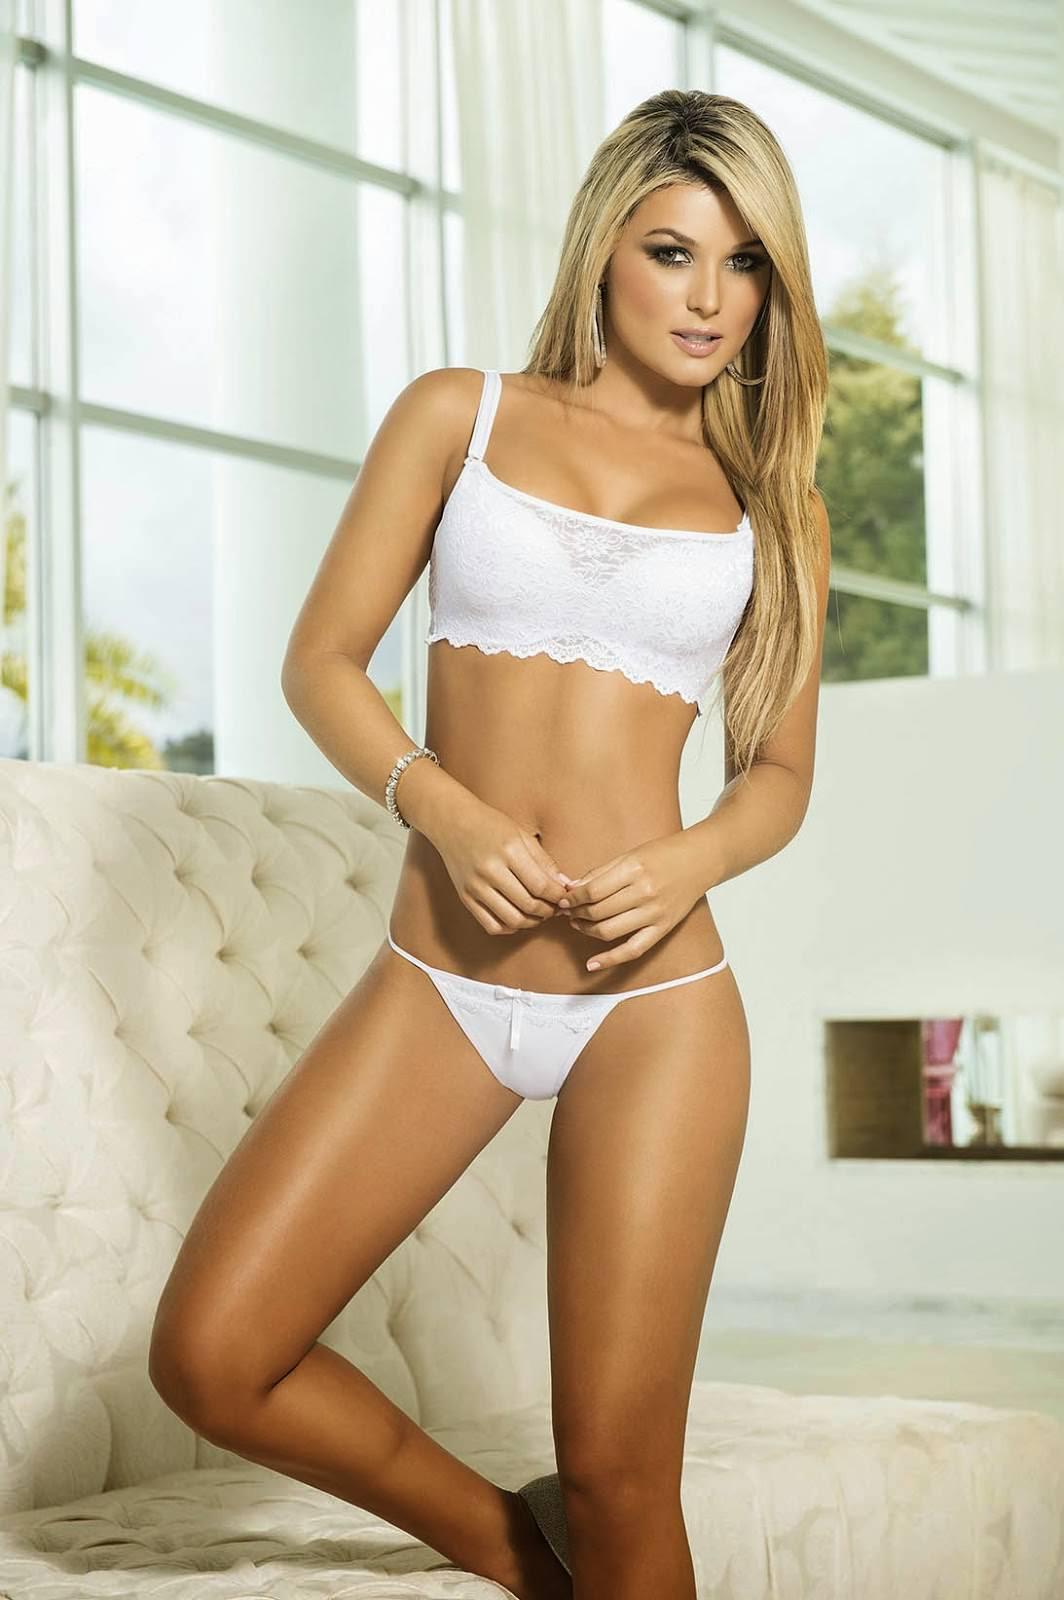 Upskirt colombiana chica latina clasificados3xcom - 2 4